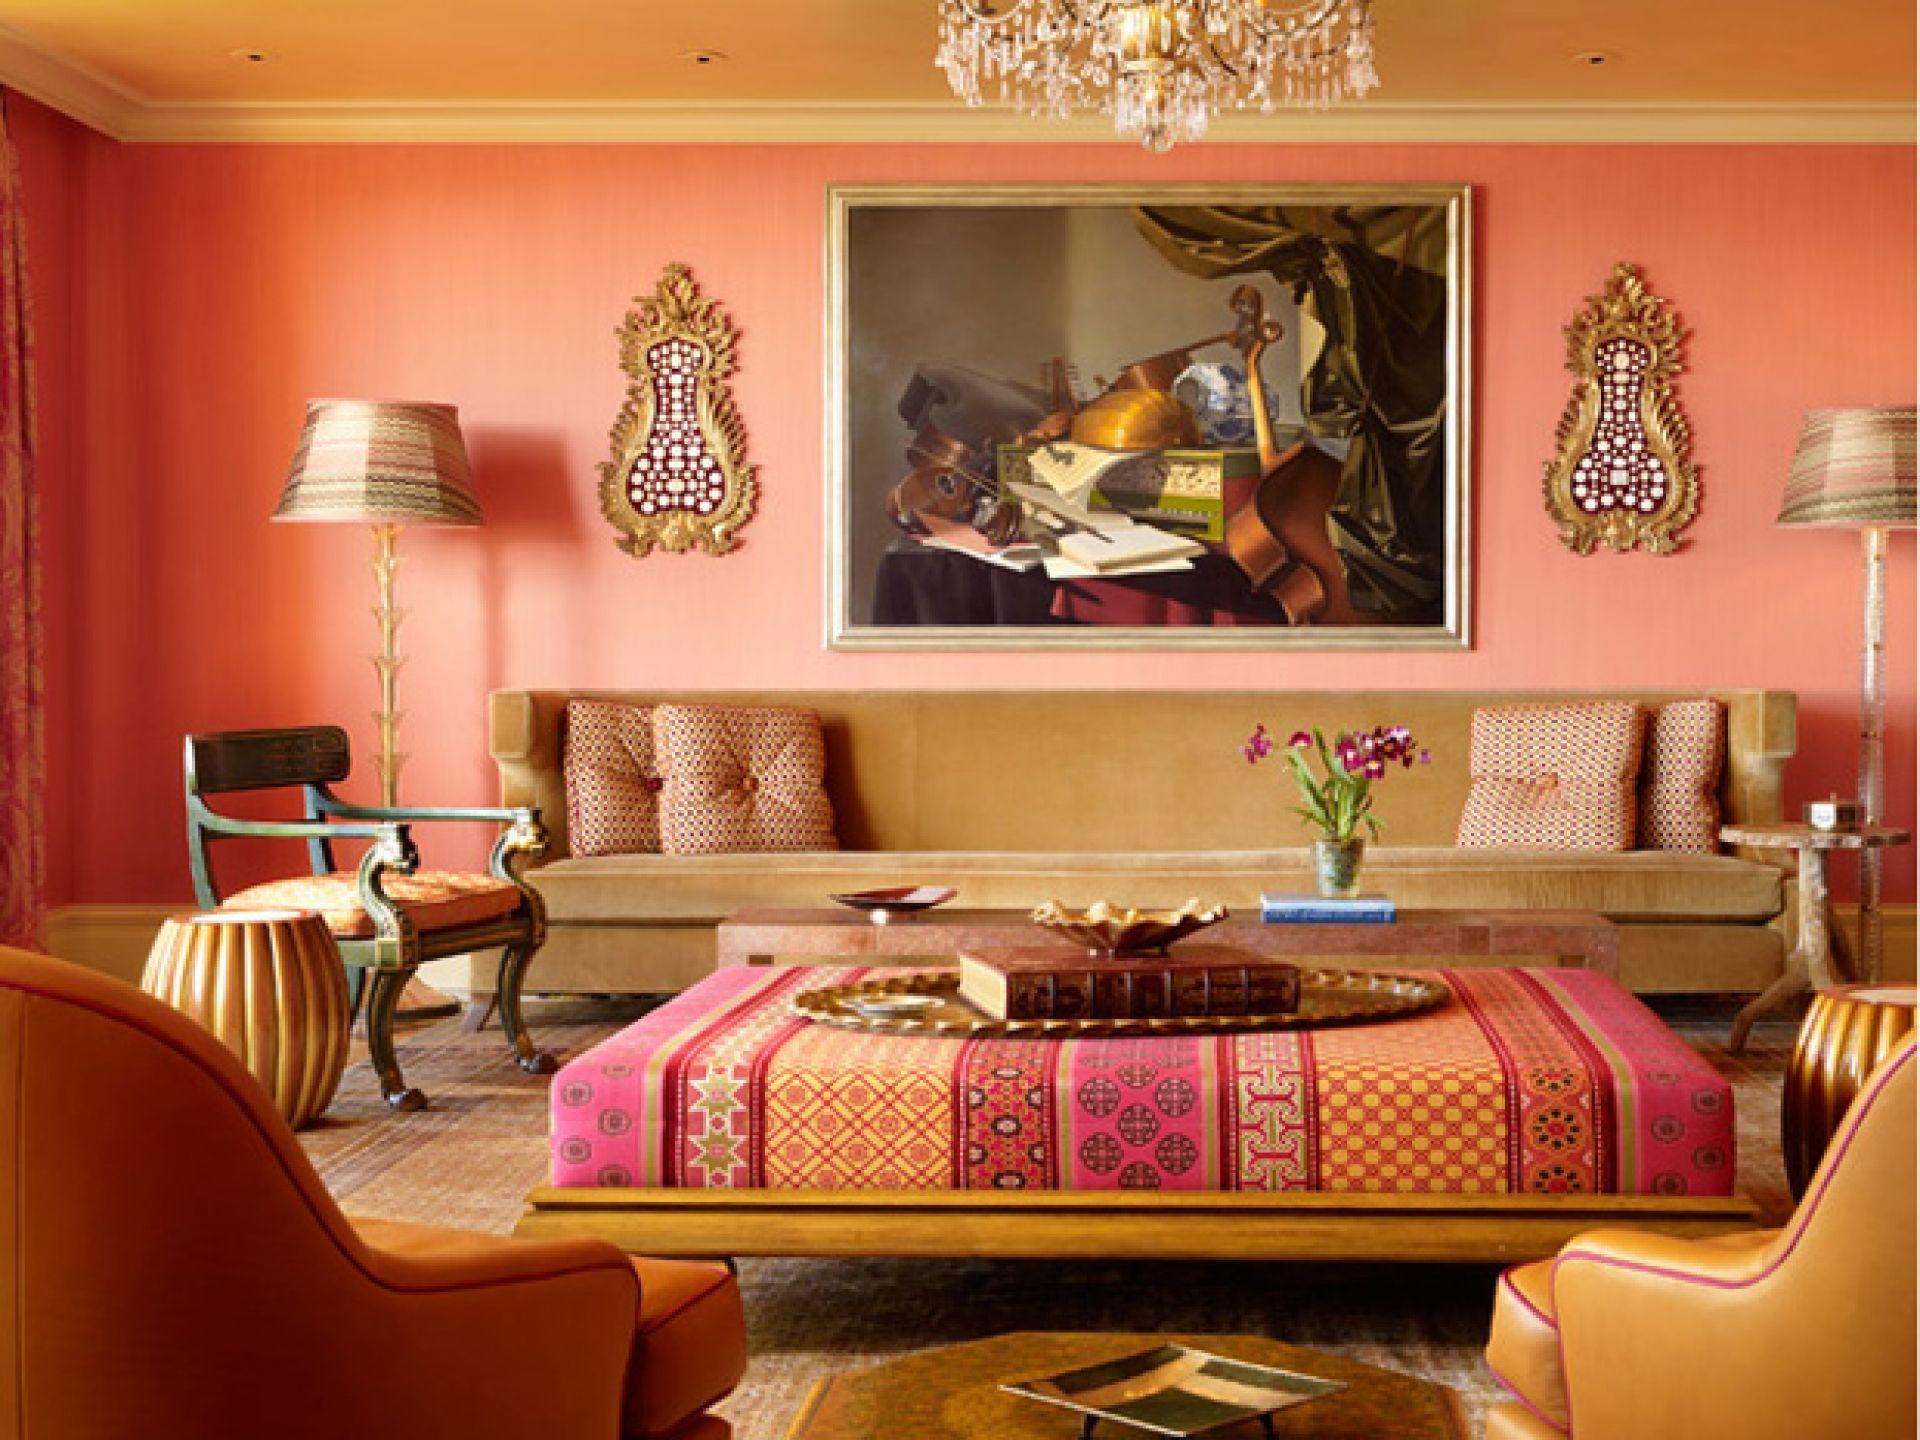 Moroccan Interior Design - http://new-yorkcity.co/816/moroccan ...